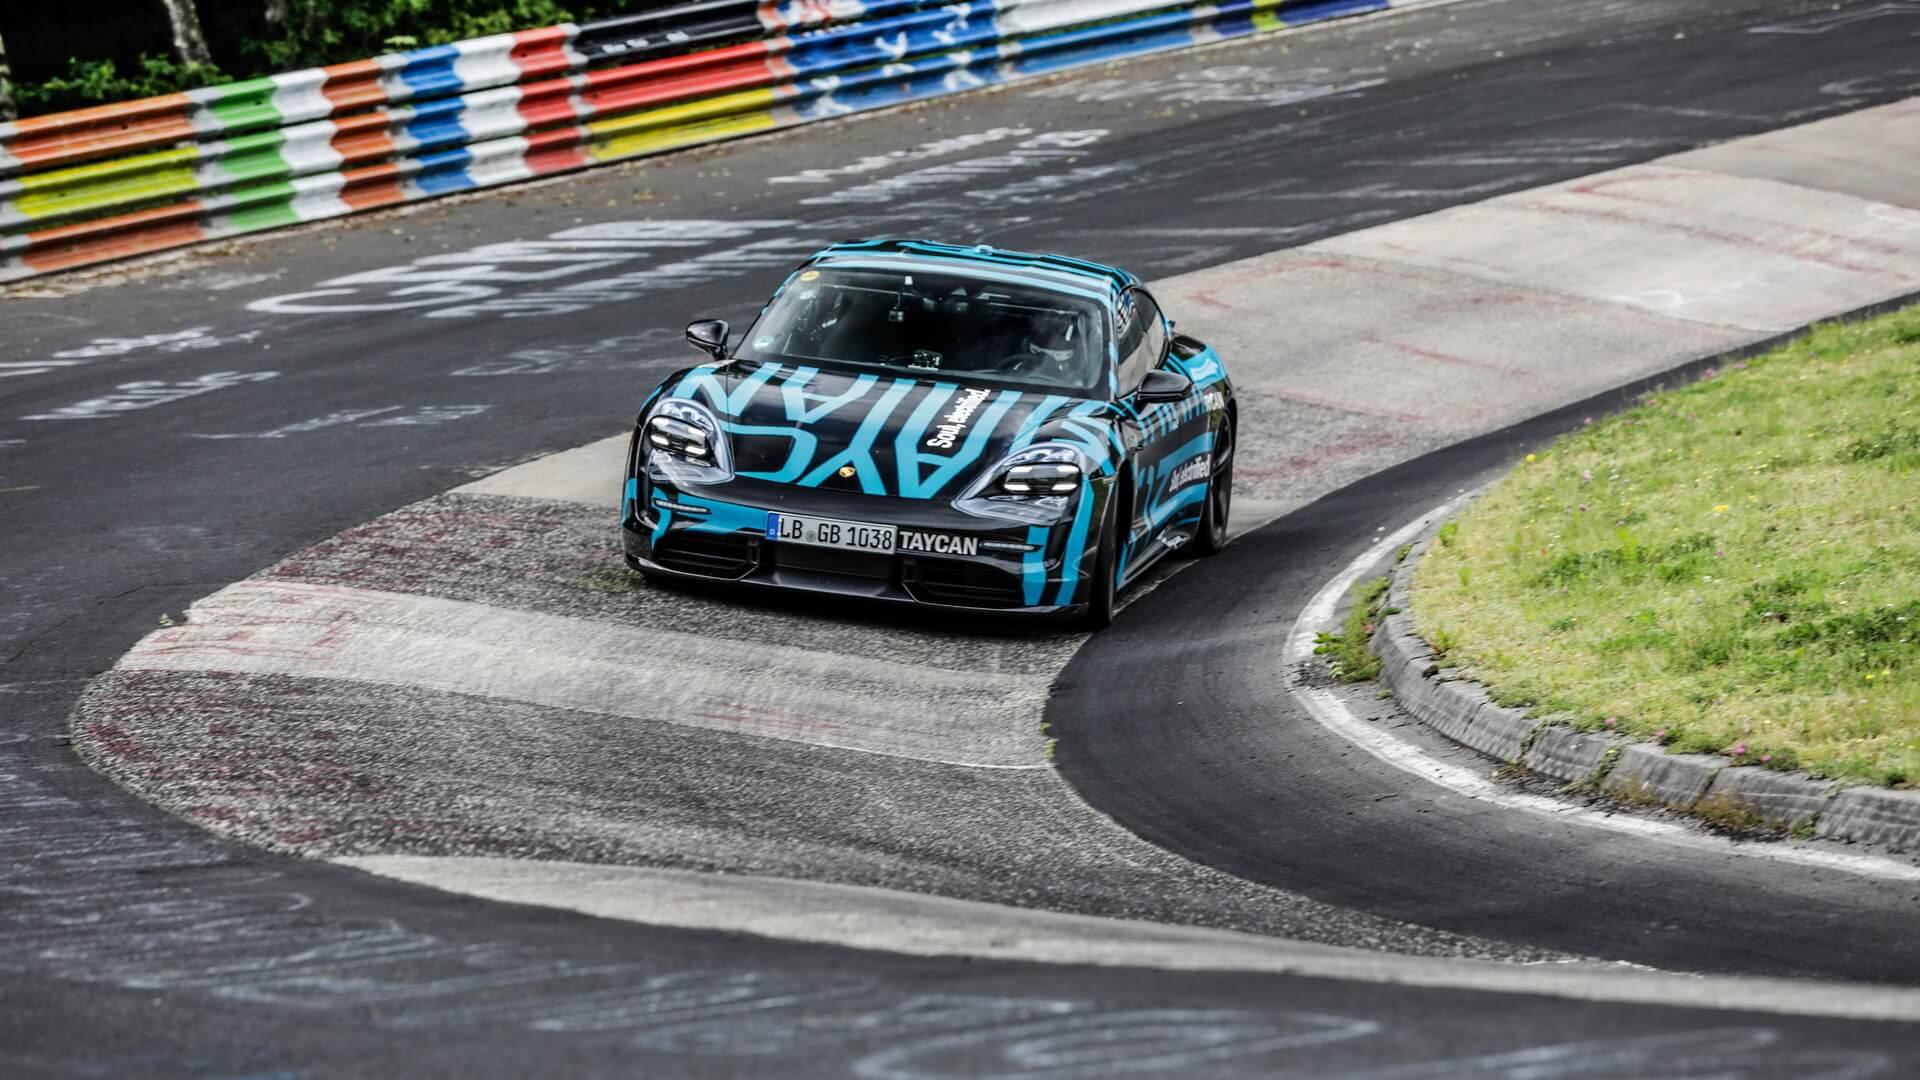 Porsche Taycan установил рекорд Нюрбургринга для четырехдверных электромобилей